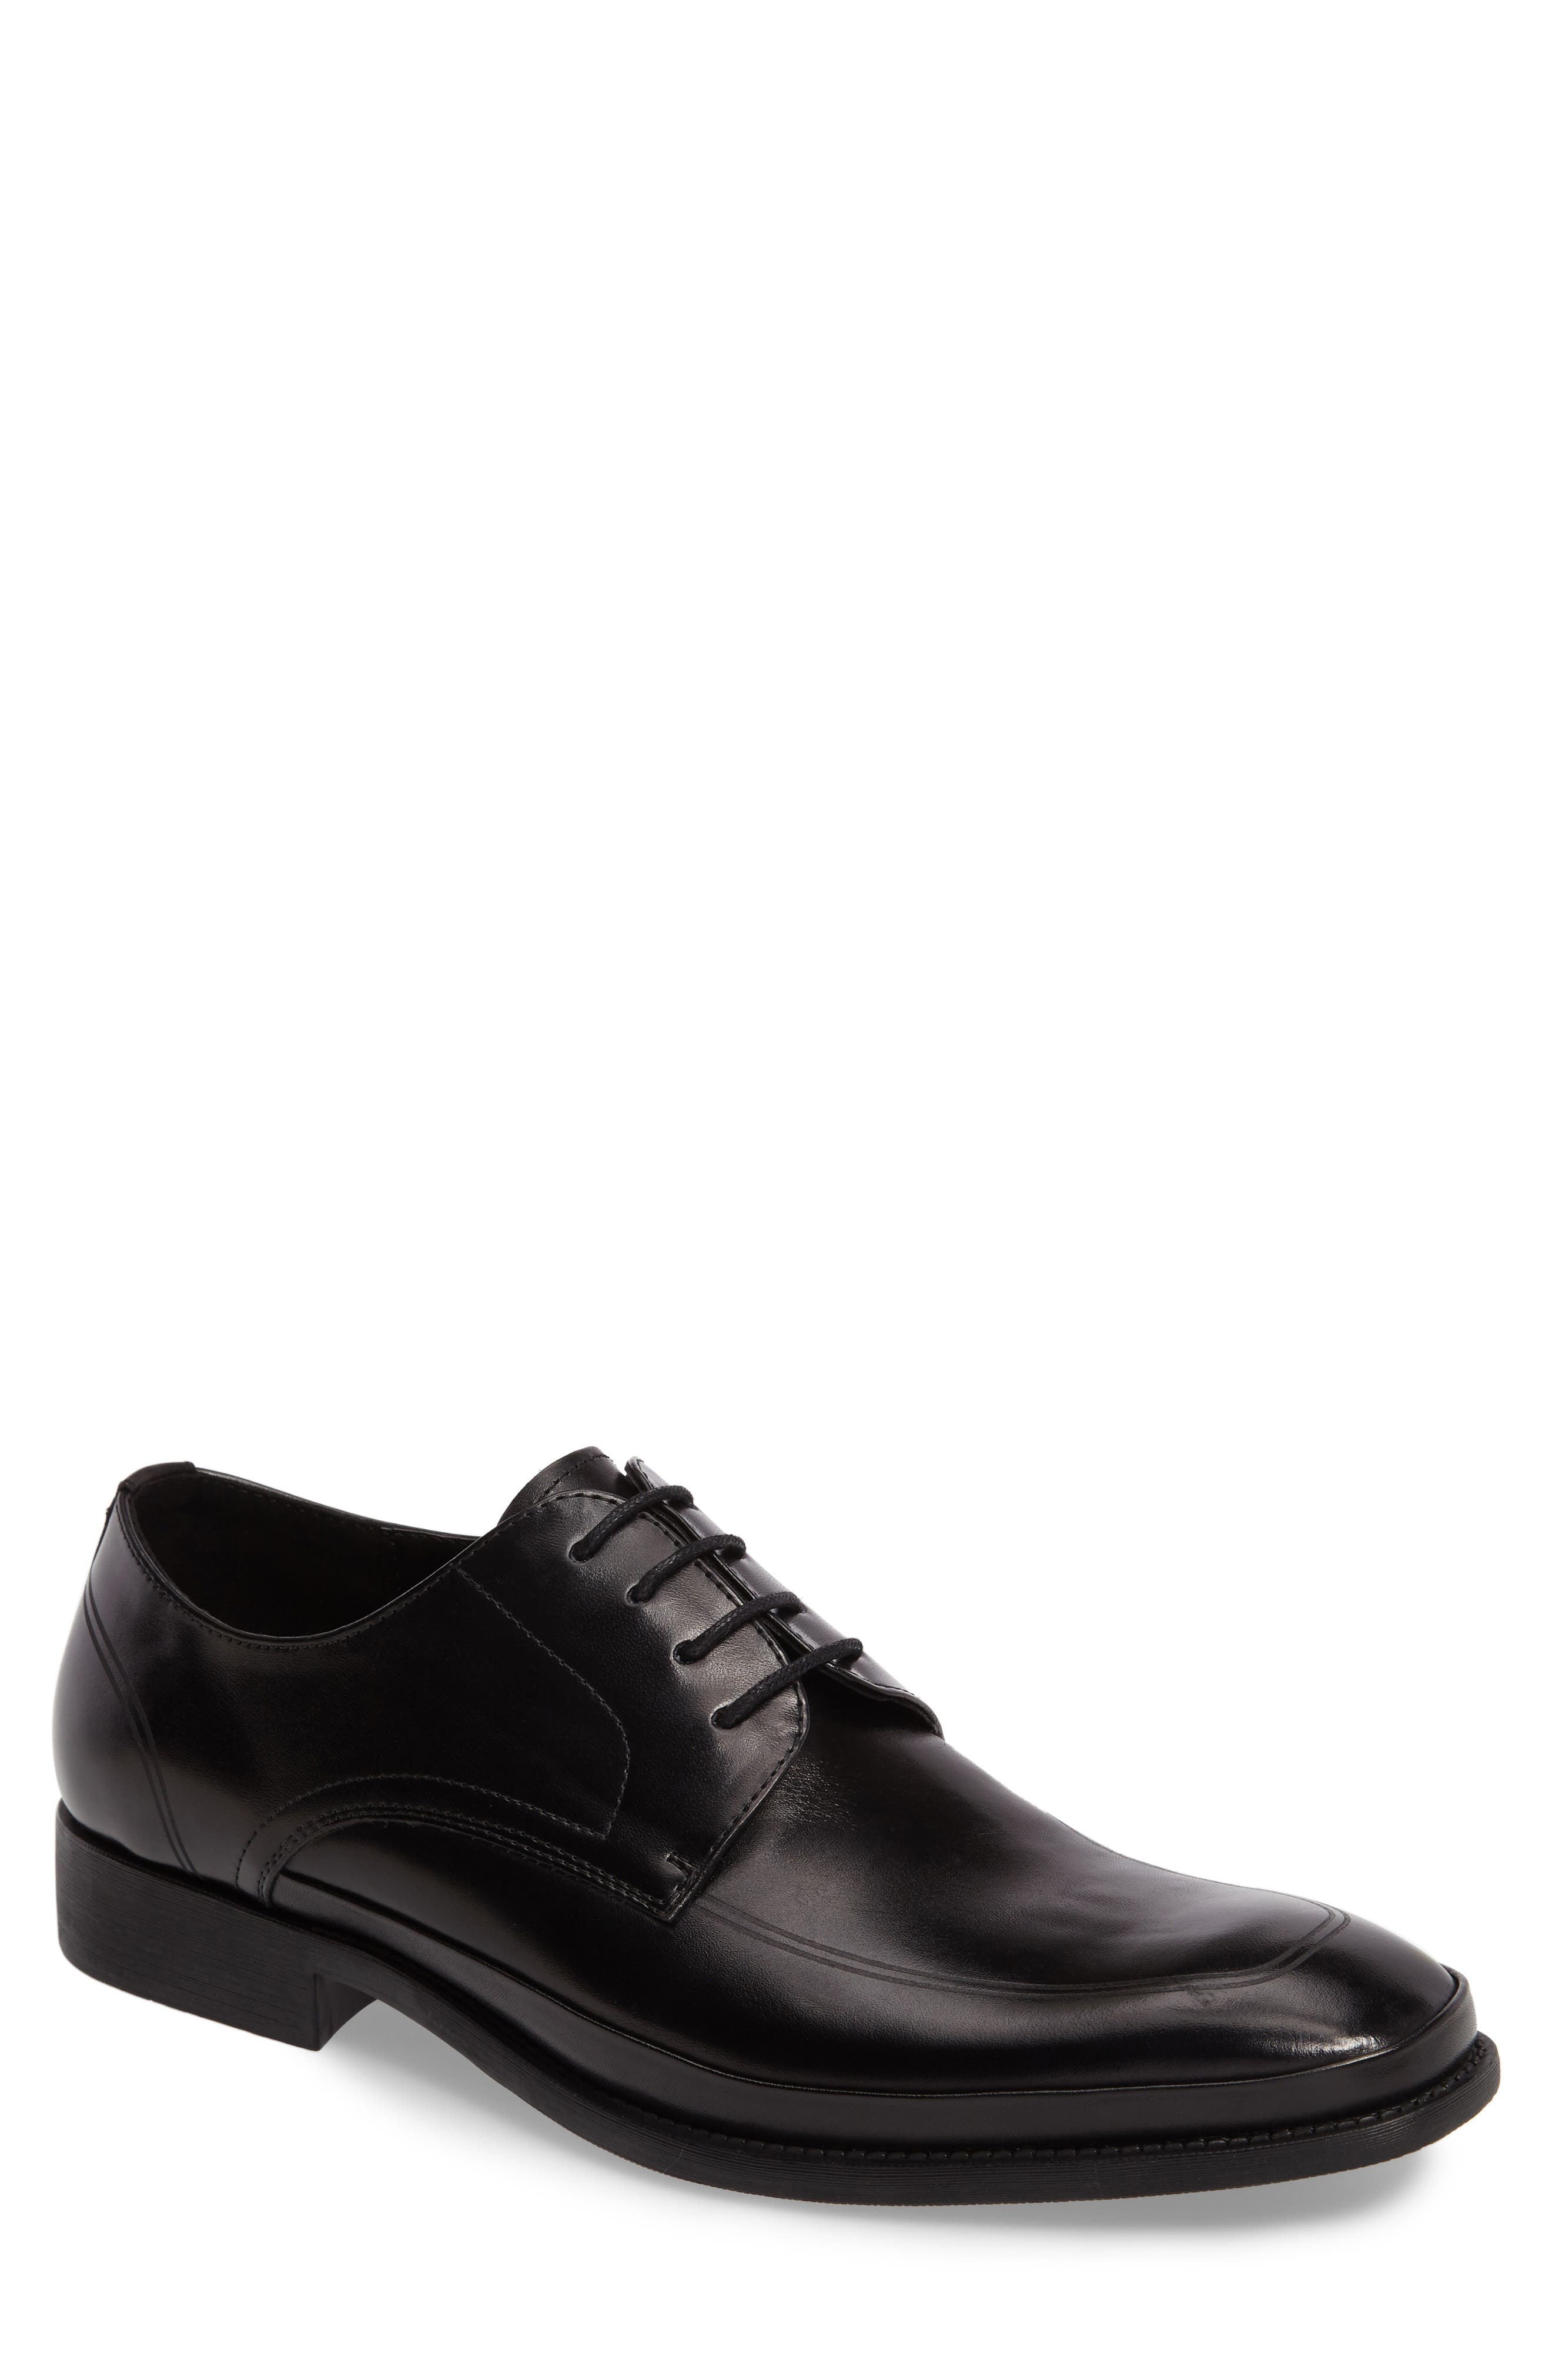 Brick Free Plain Toe Derby,                         Main,                         color, Black Leather